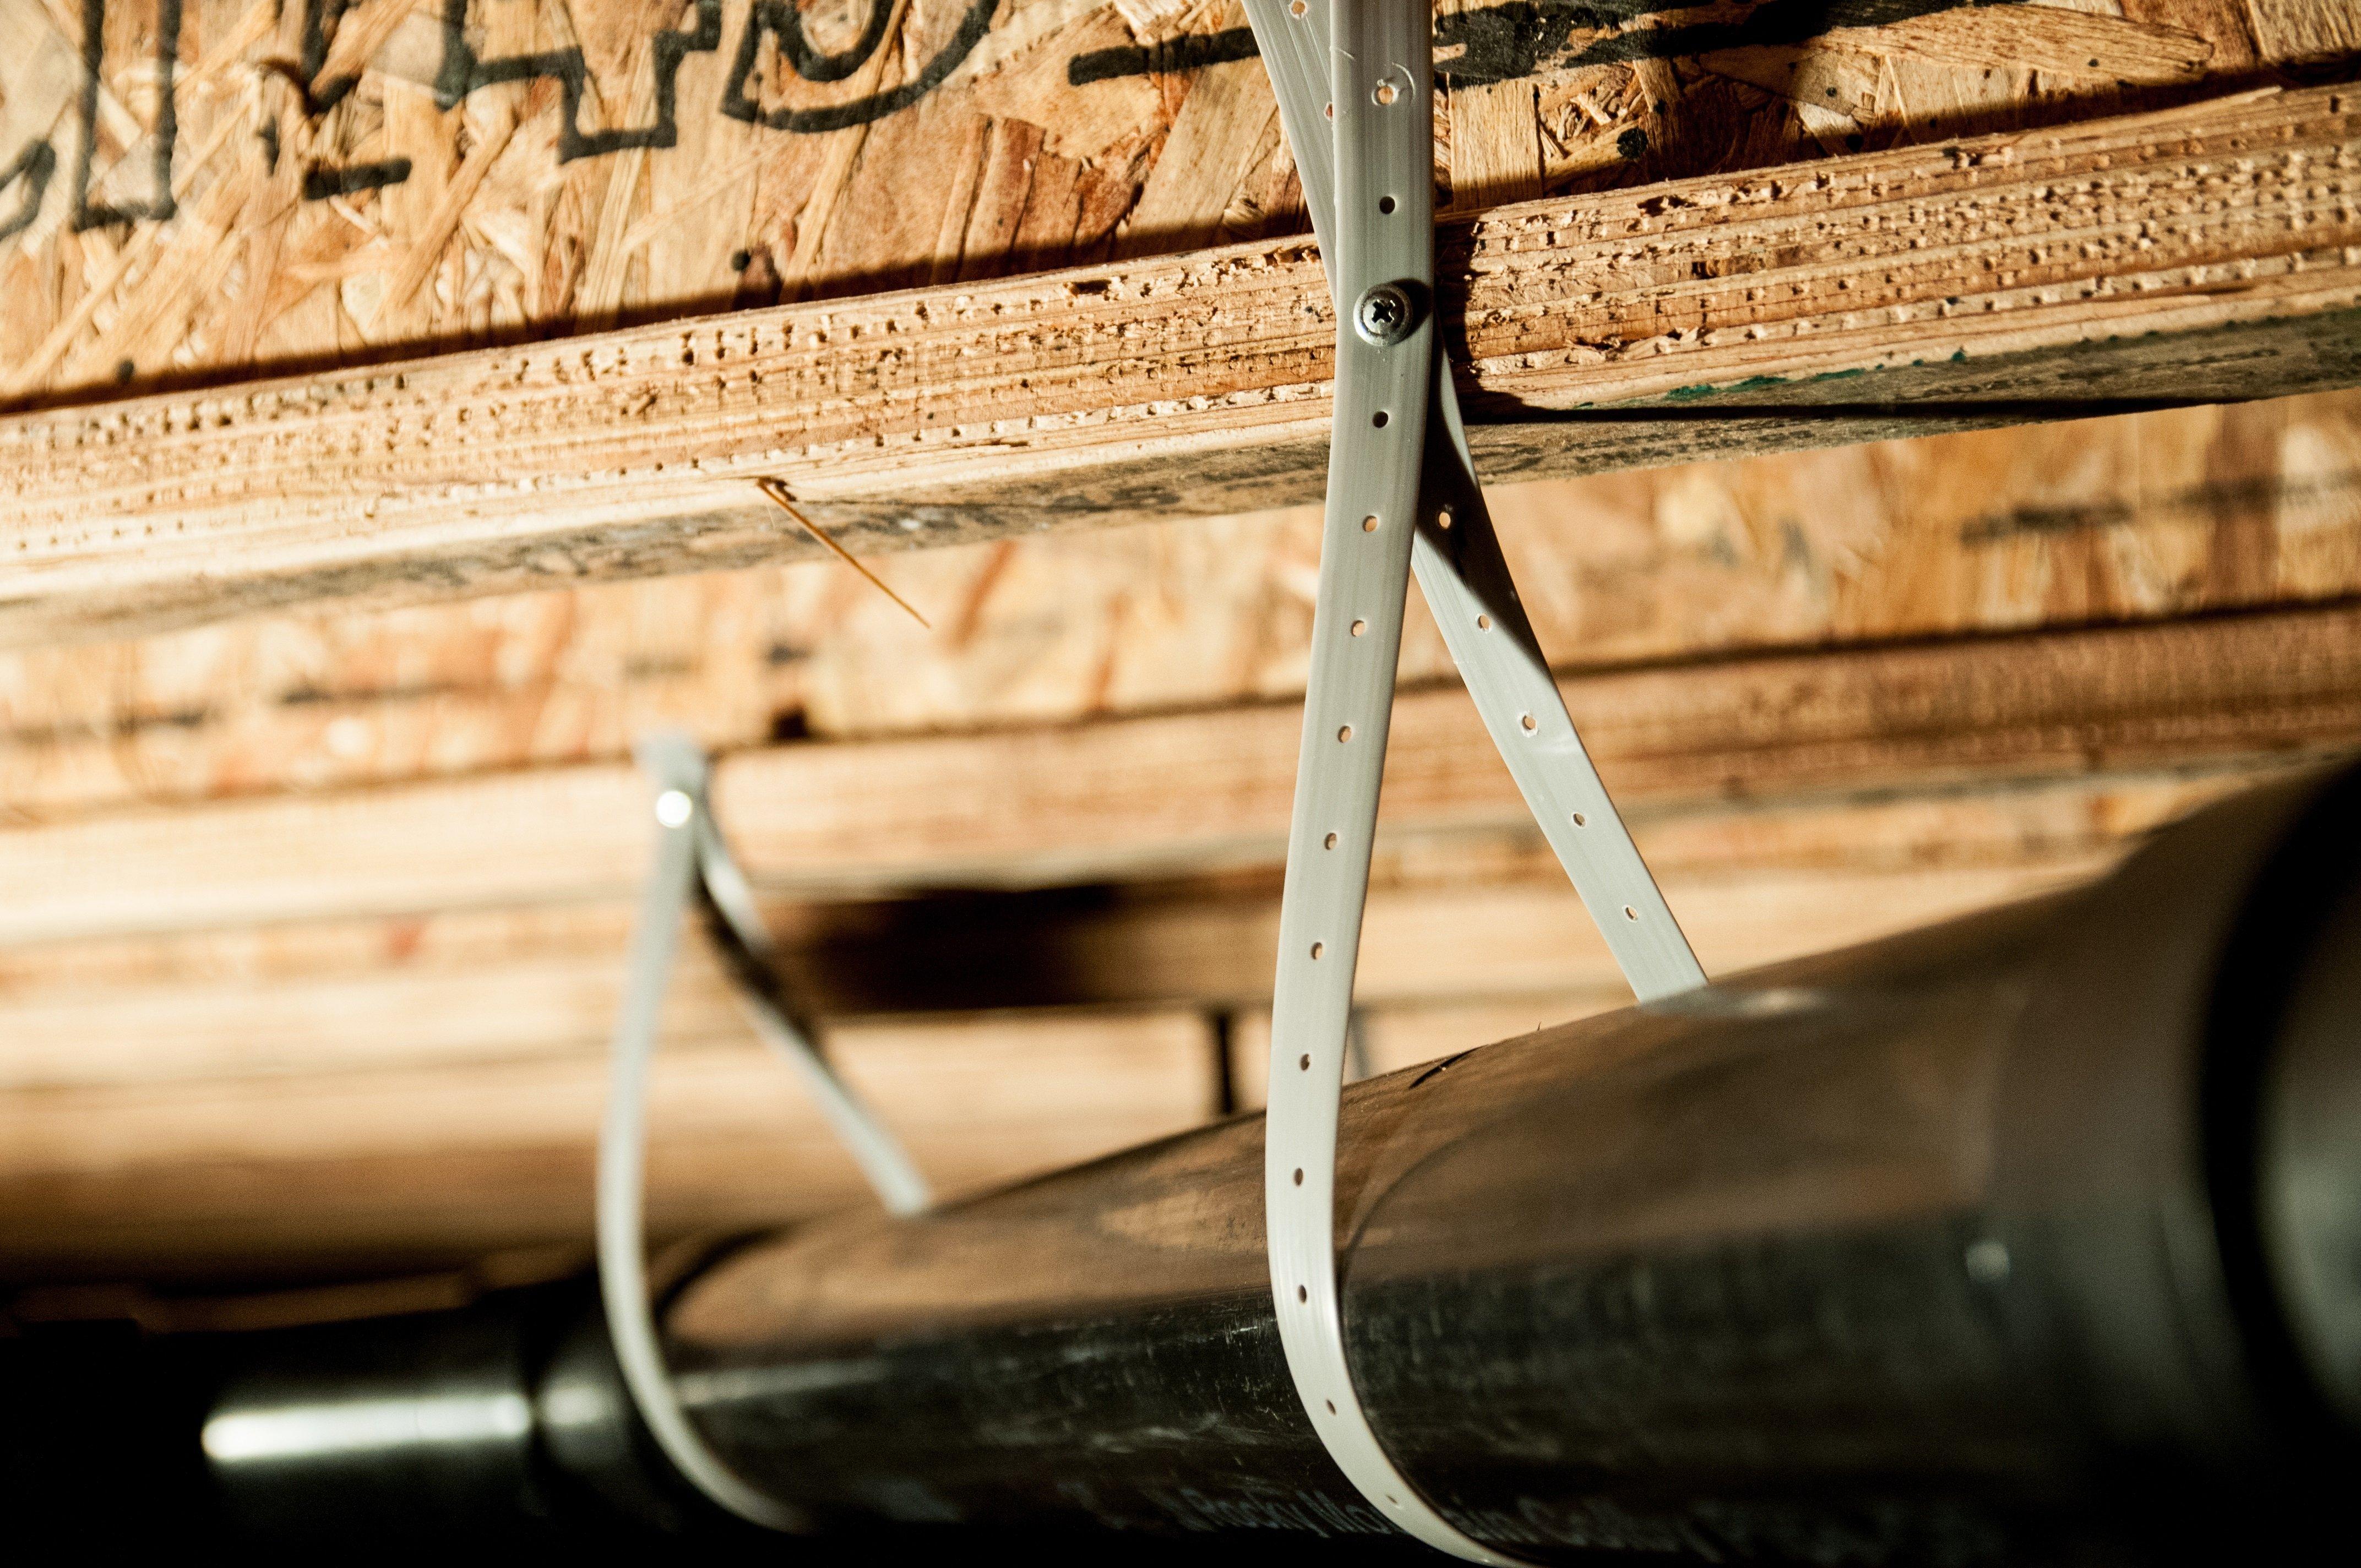 Plumbing work in Juneau